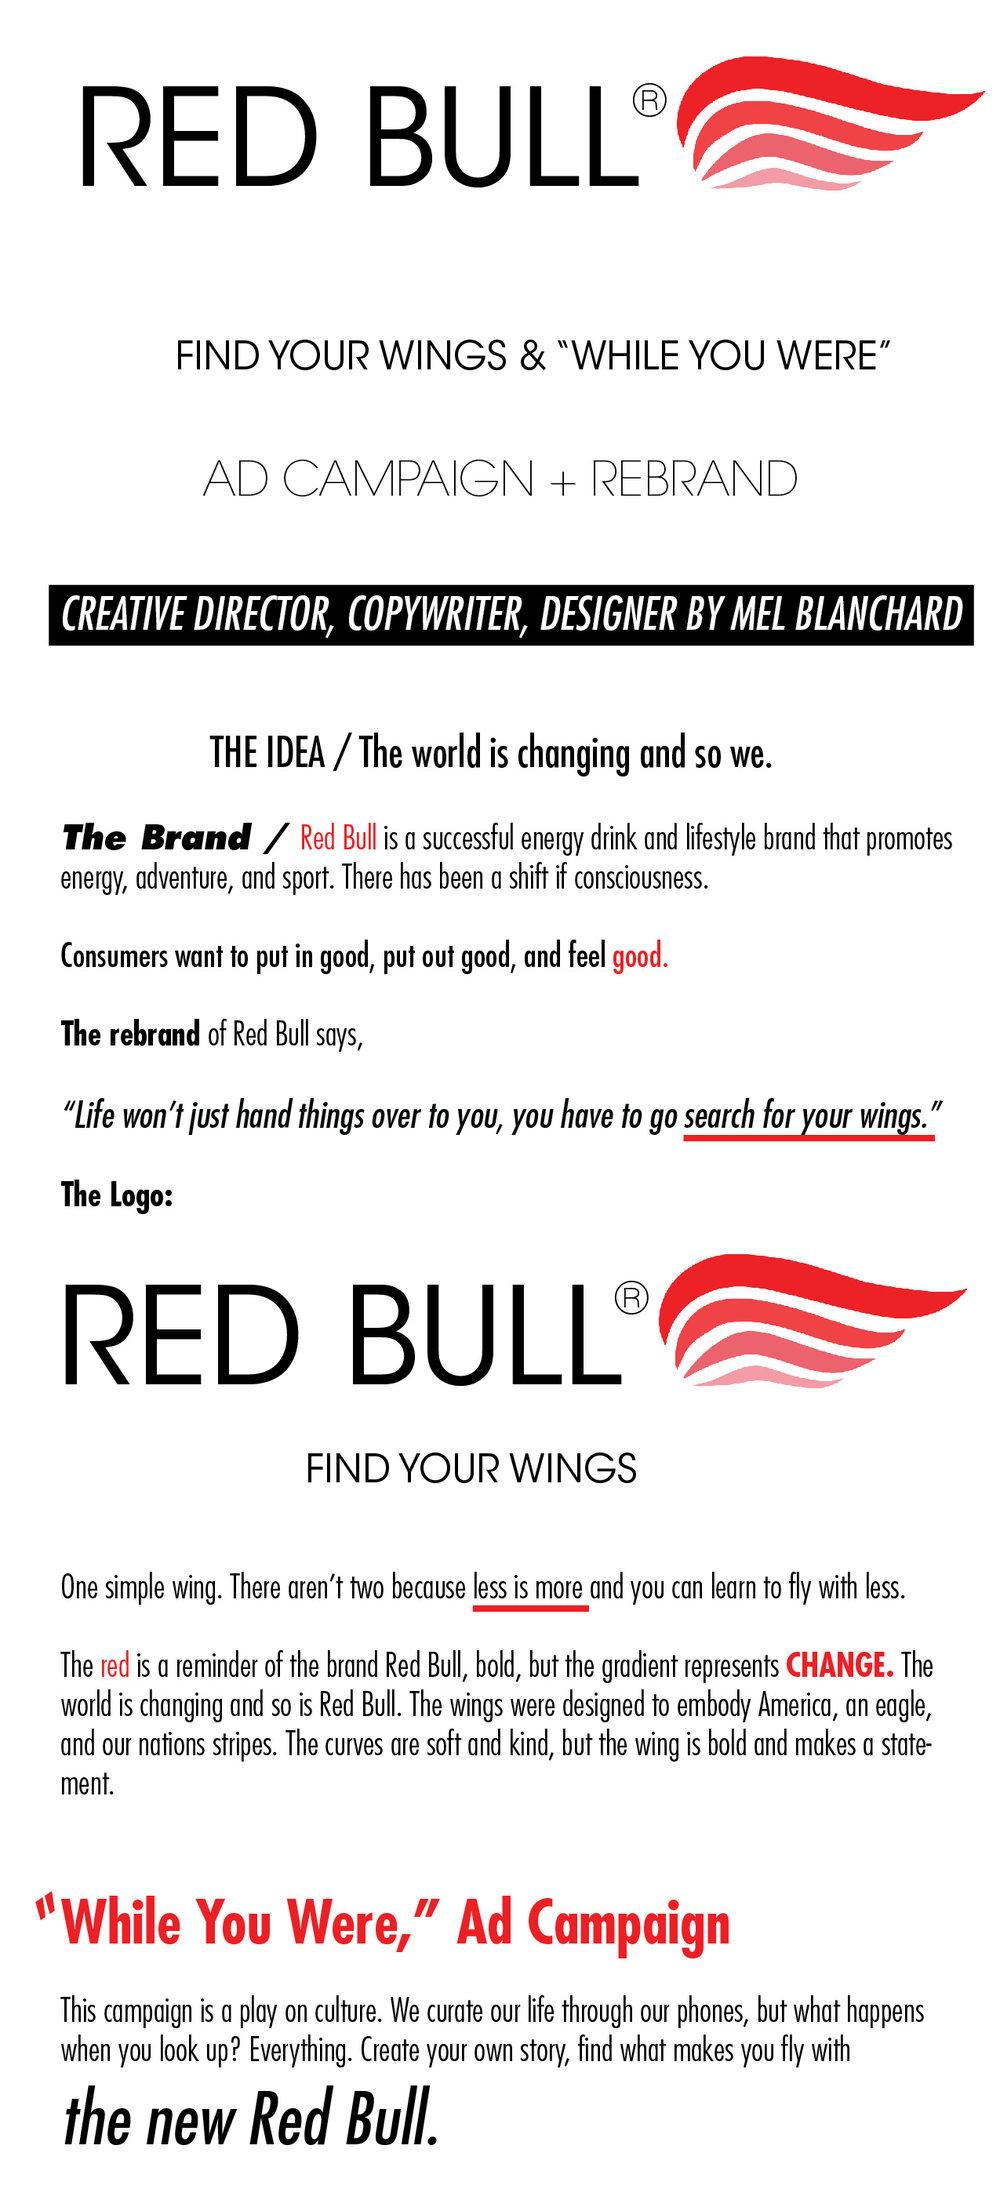 mel blanchard gong ad campaign Redbull card-01.jpg